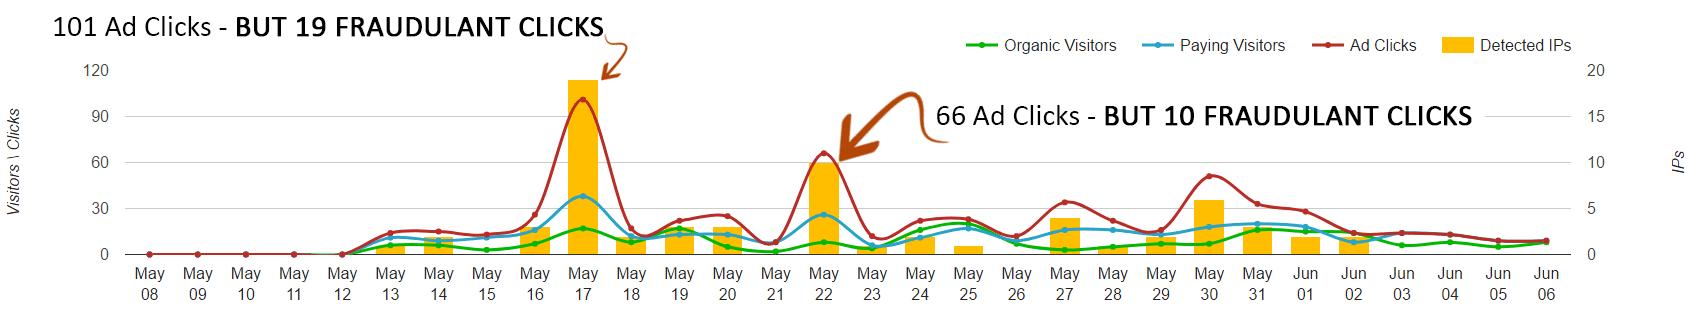 Evidence graph